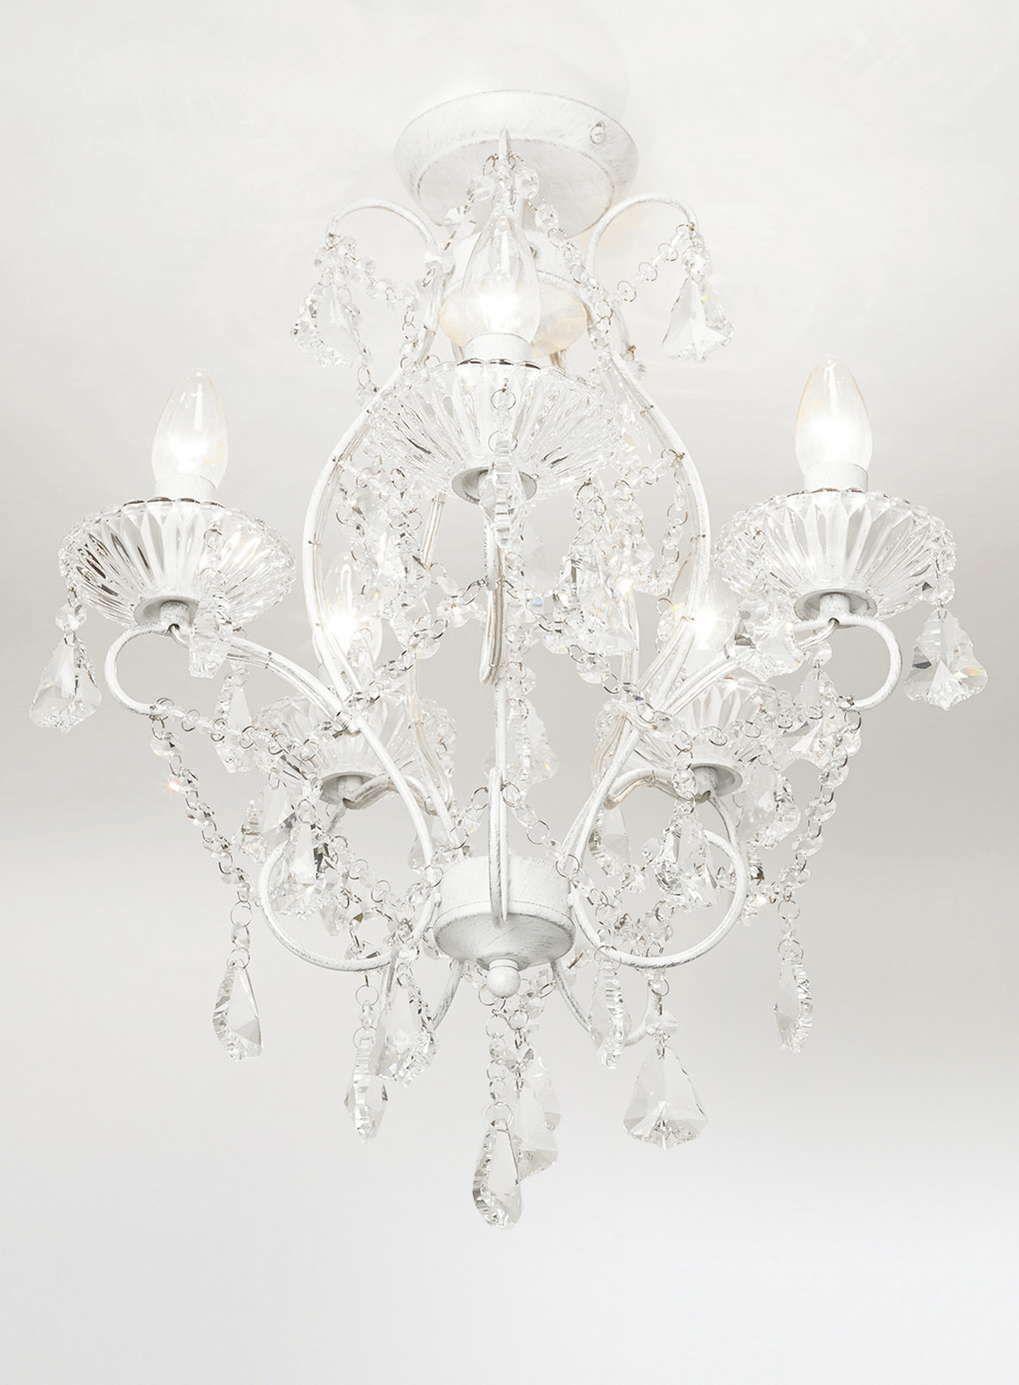 Hermione 5 light Flush Ceiling Light - BHS   Home ideas   Pinterest ...